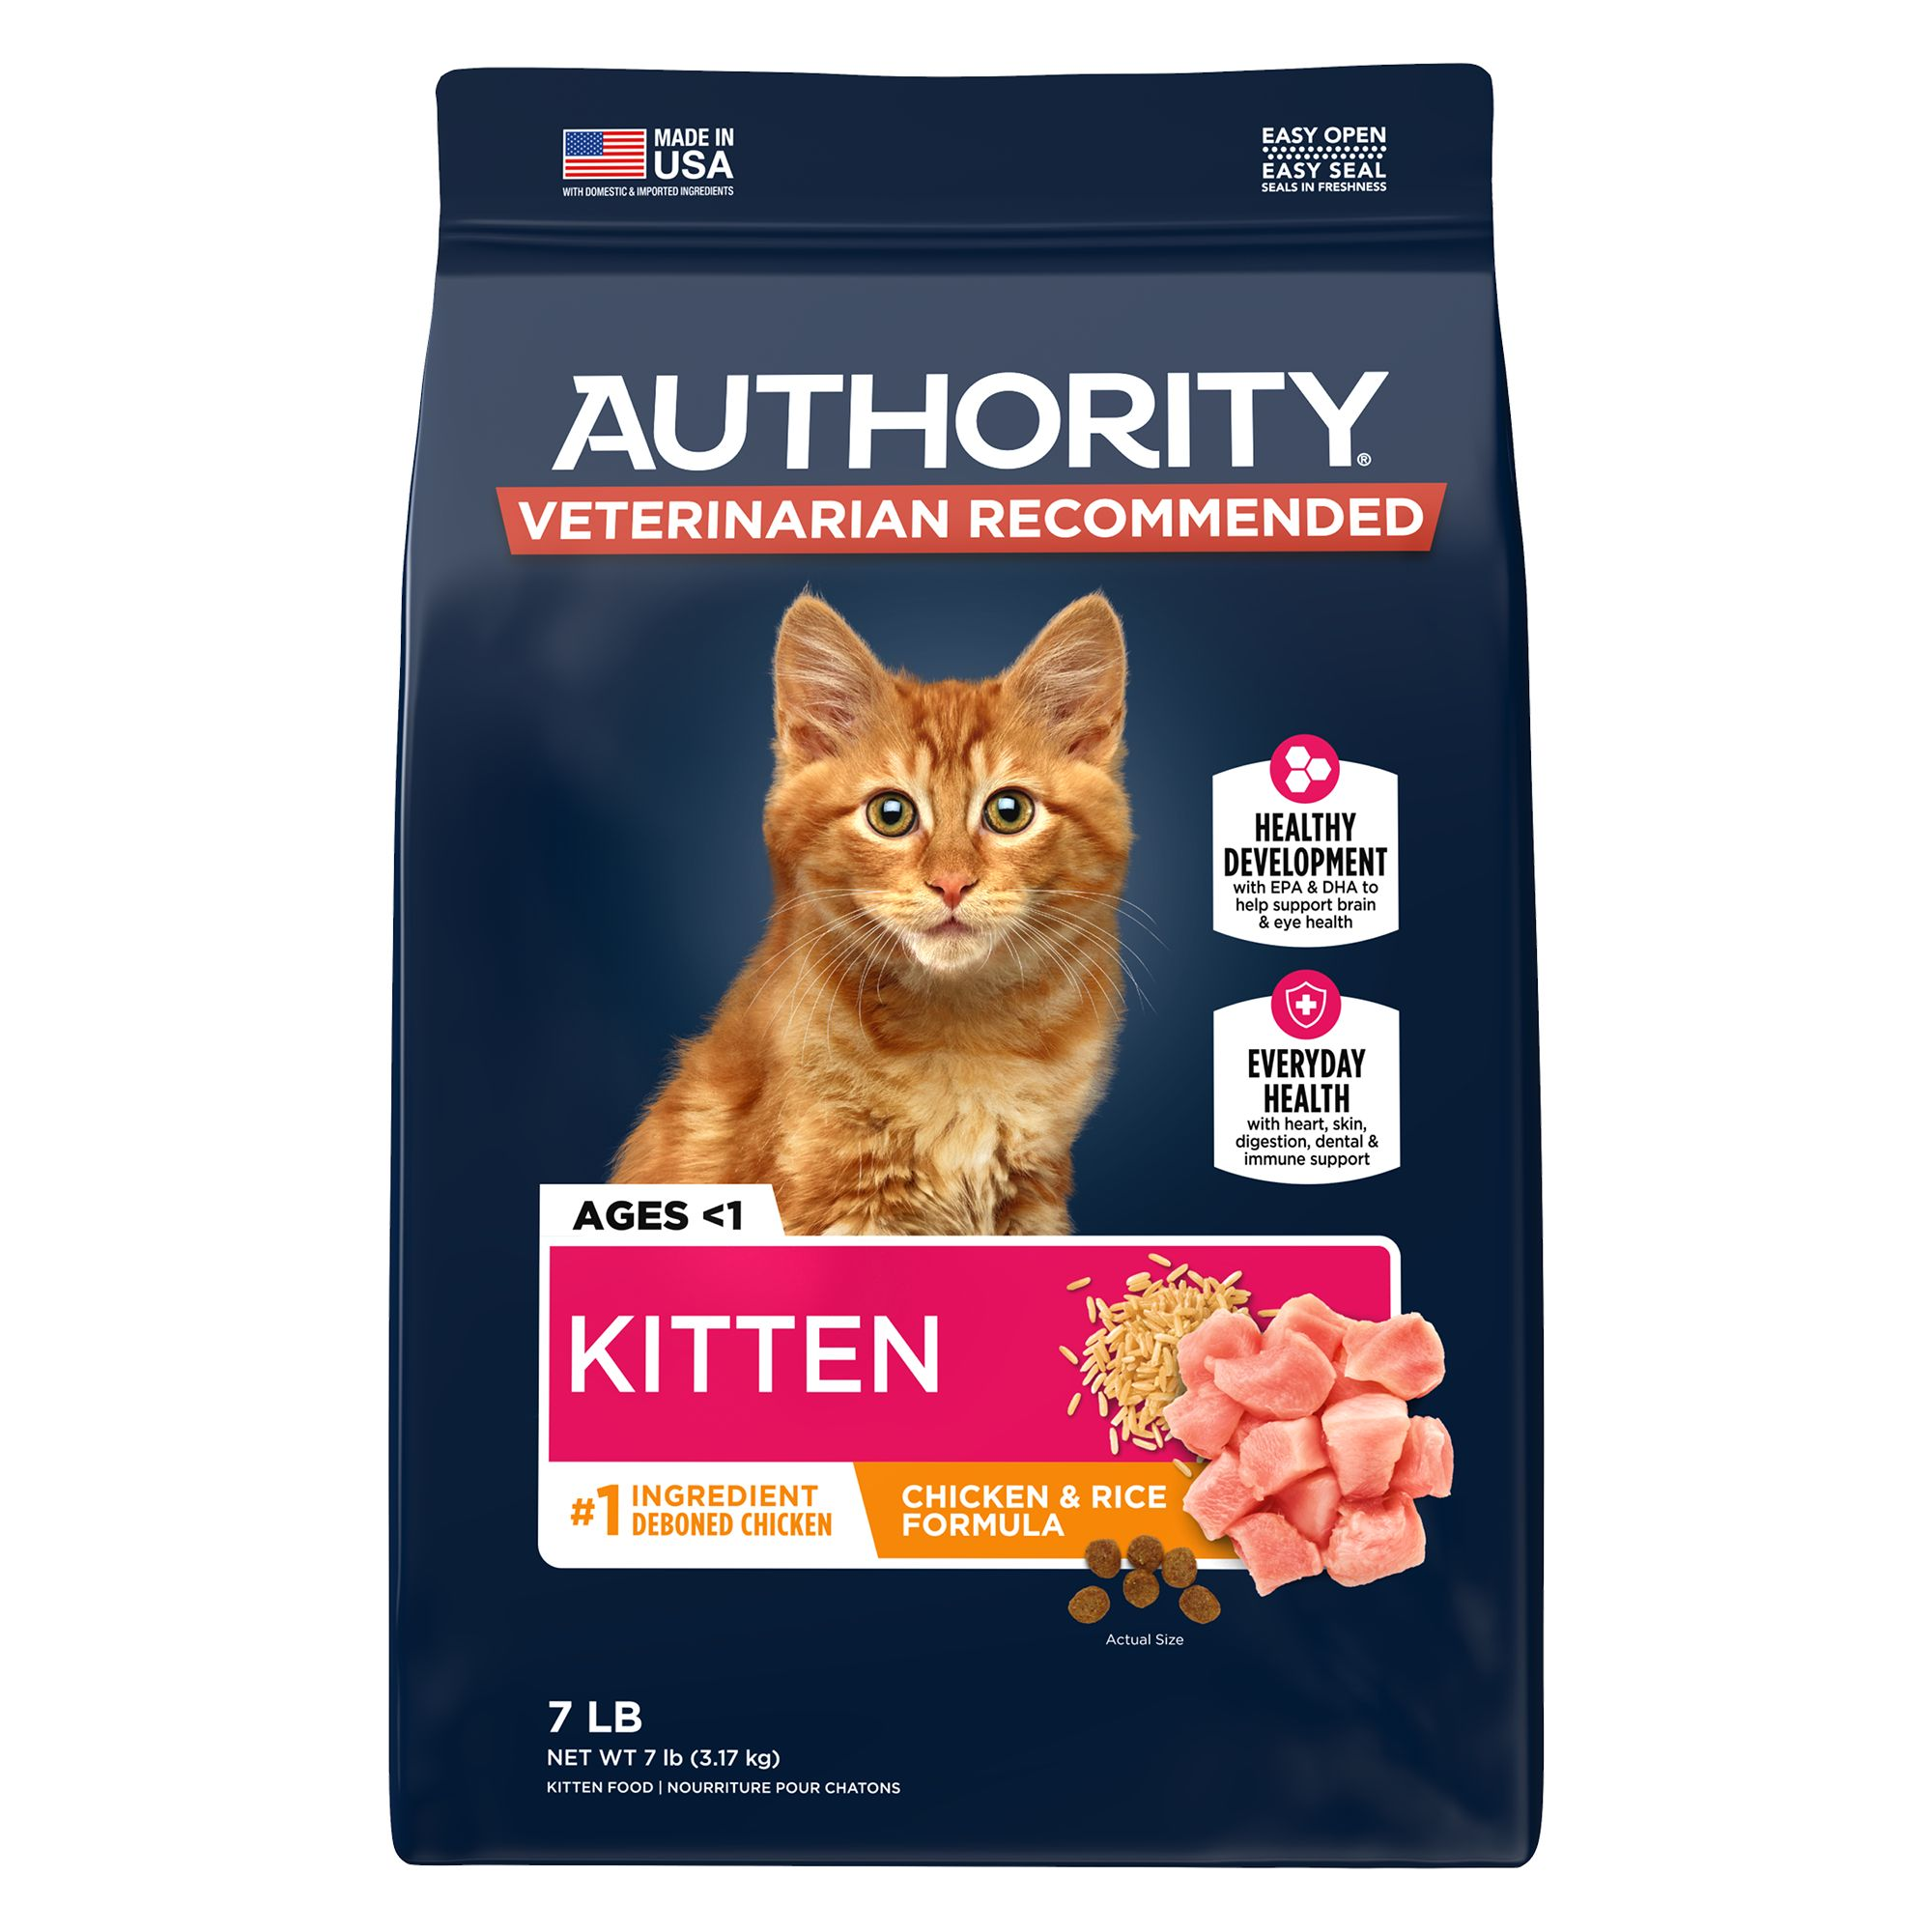 Authority Kitten Food Chicken Rice Cat Dry Food Petsmart